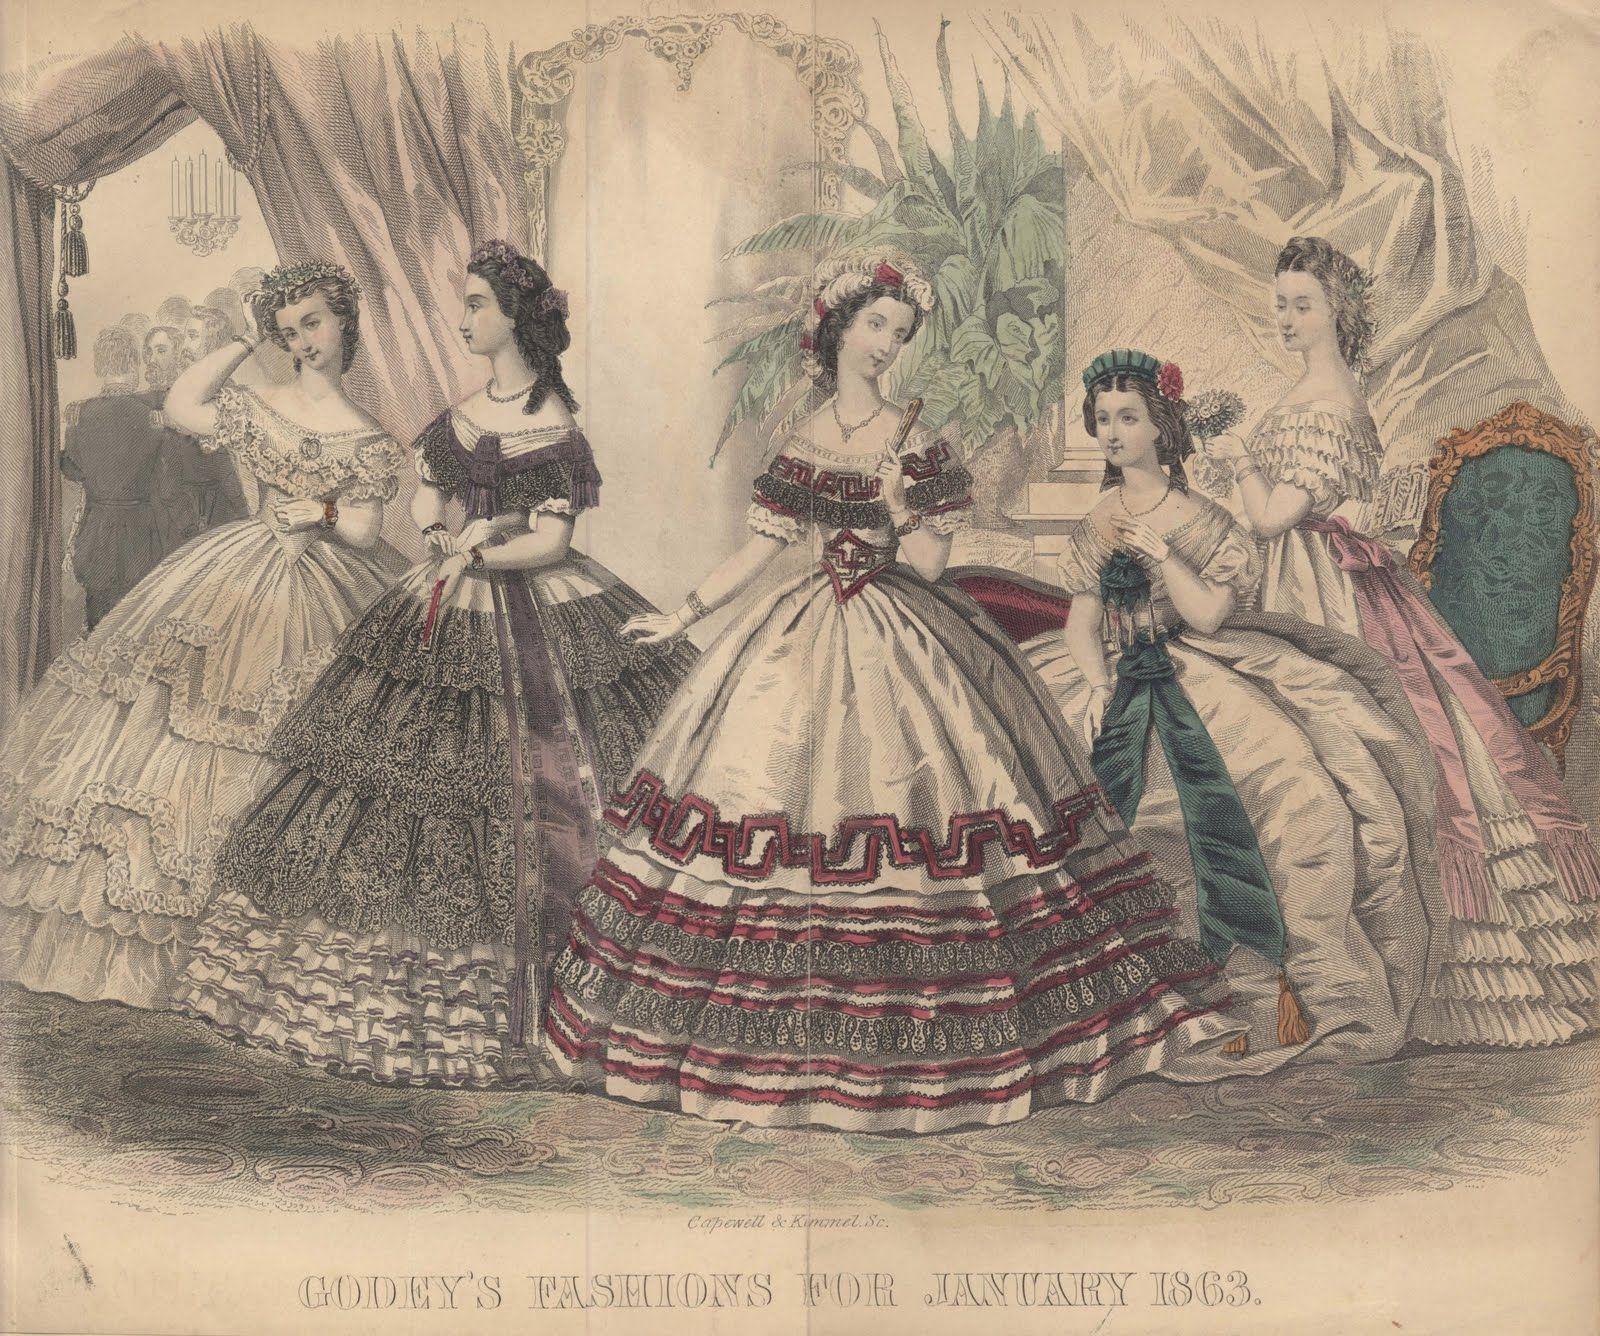 Civil War Era Clothing: Civil War Era Fashion Plate - January 1863 Godey's Lady's Book